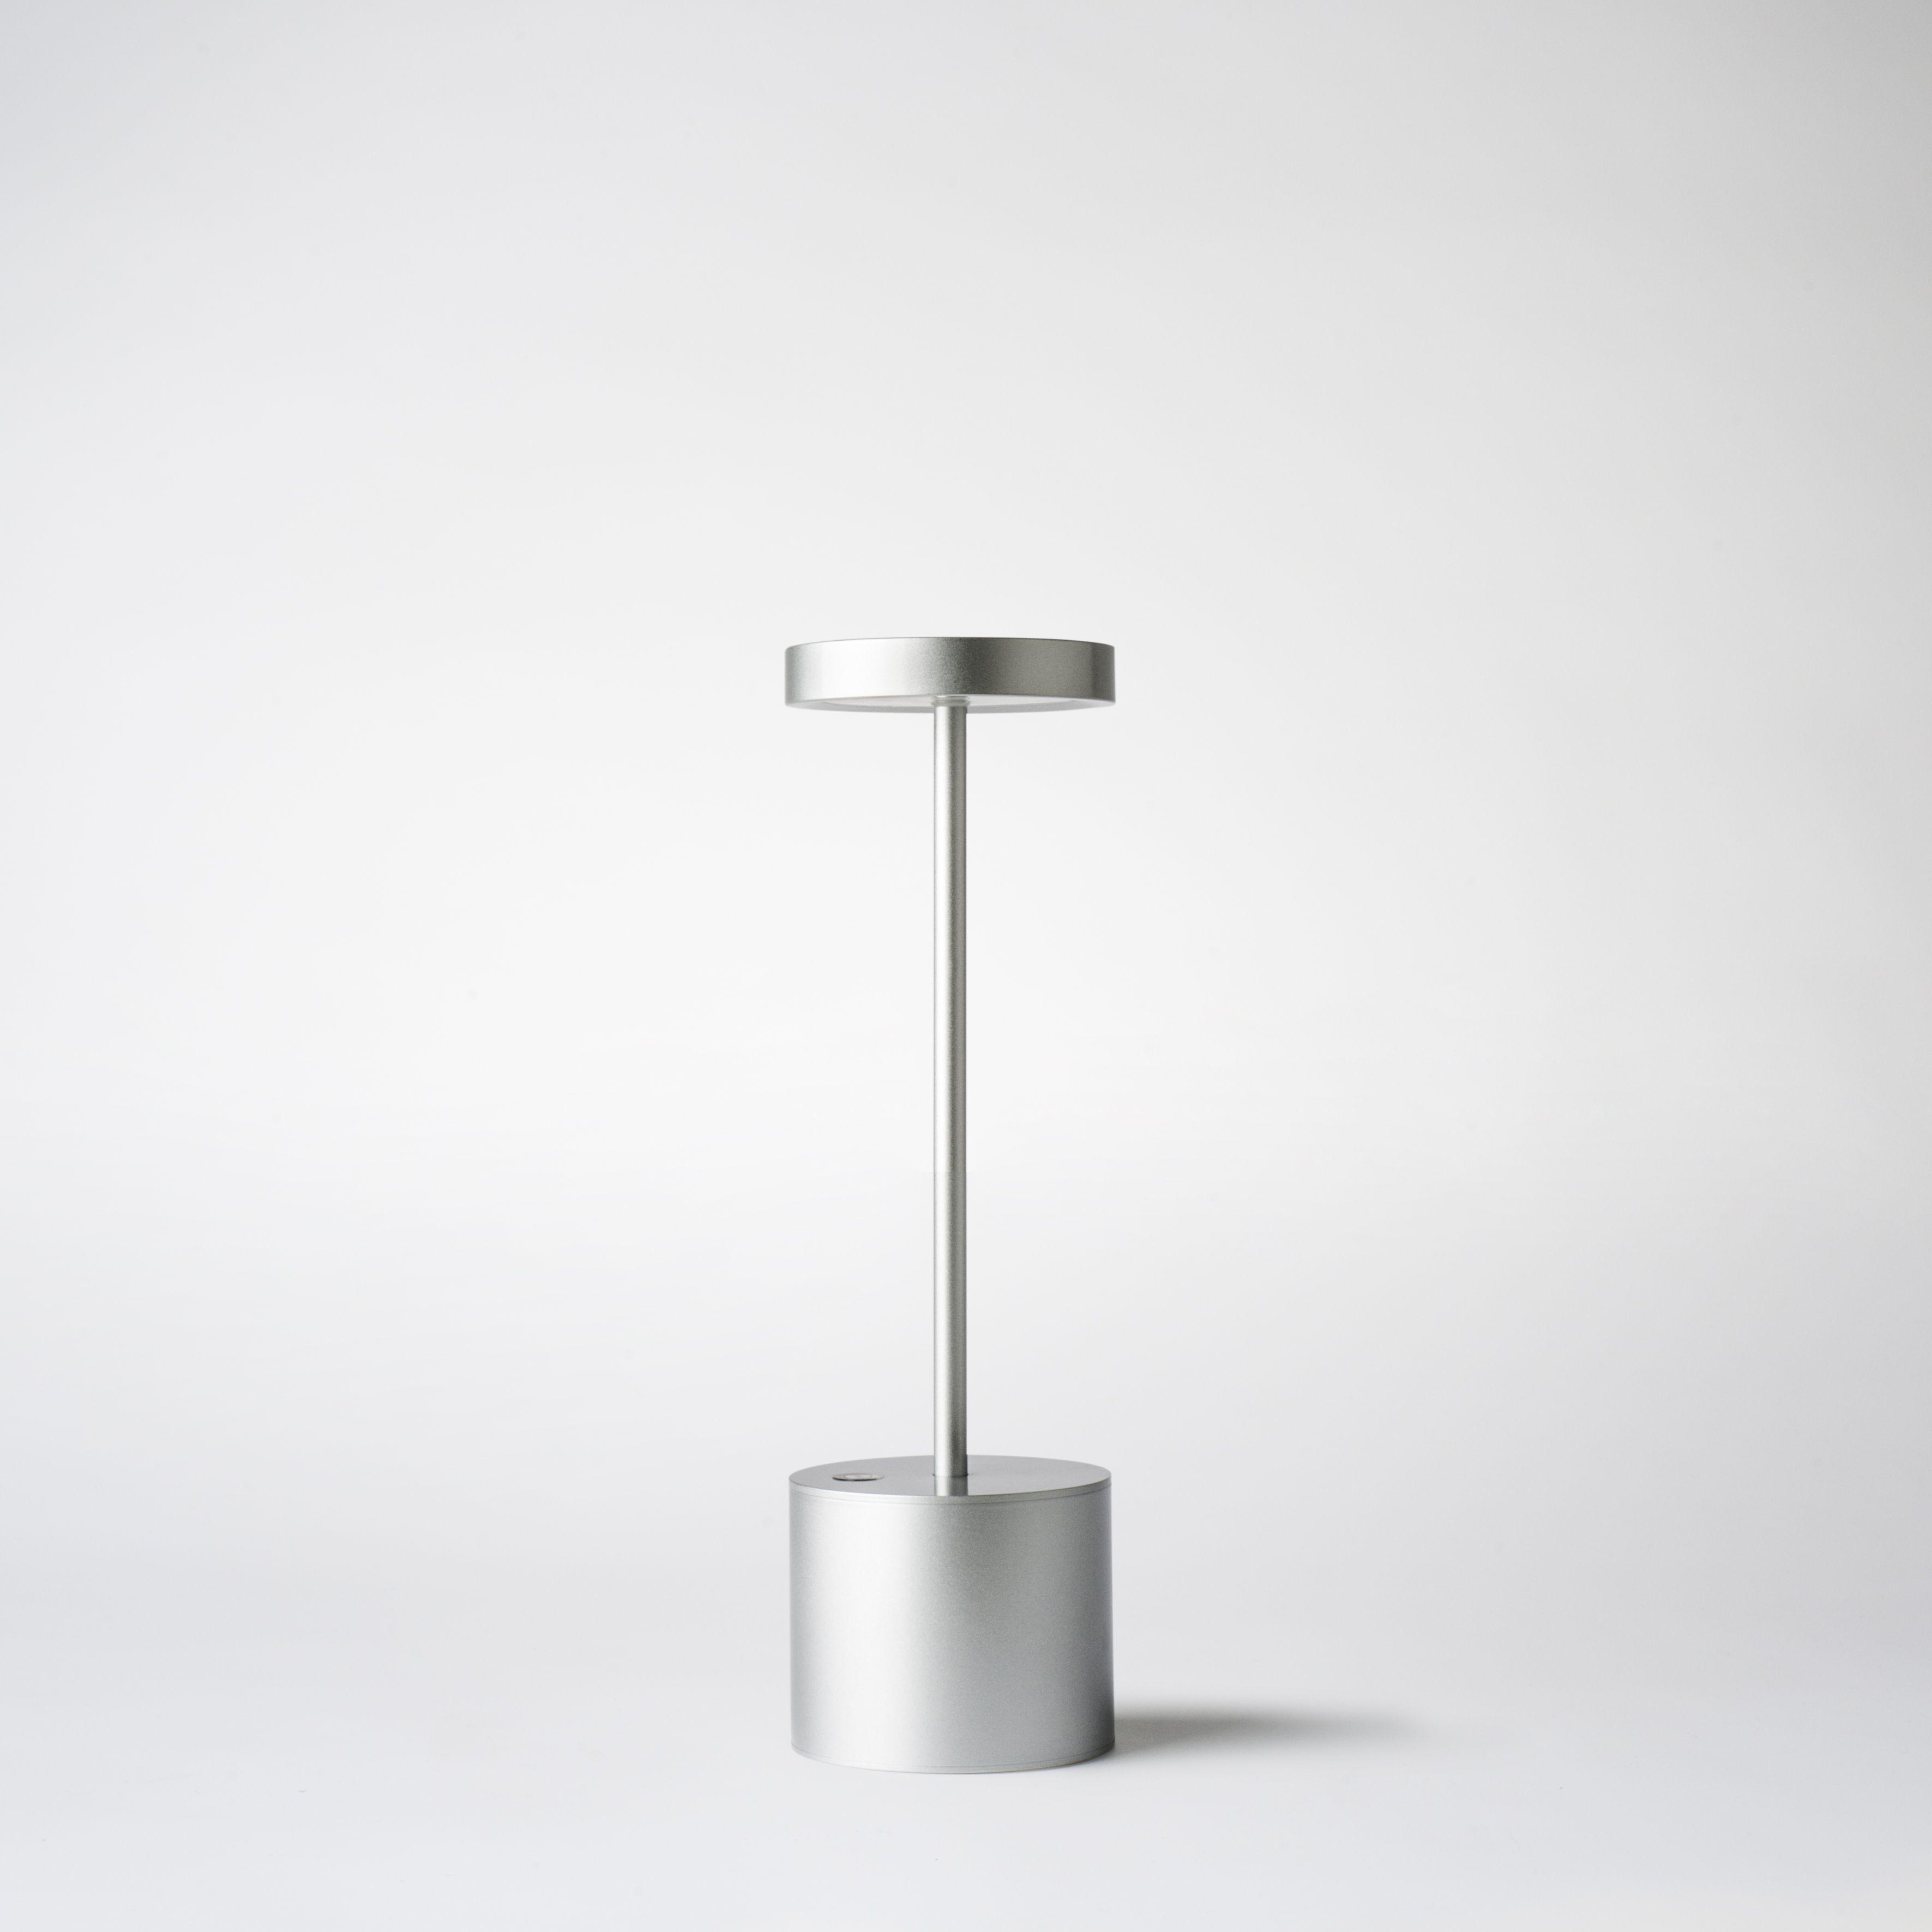 1d0f41321f1123b1e849cef17f95b304 Résultat Supérieur 60 Luxe Lampe Decorative Stock 2018 Ldkt